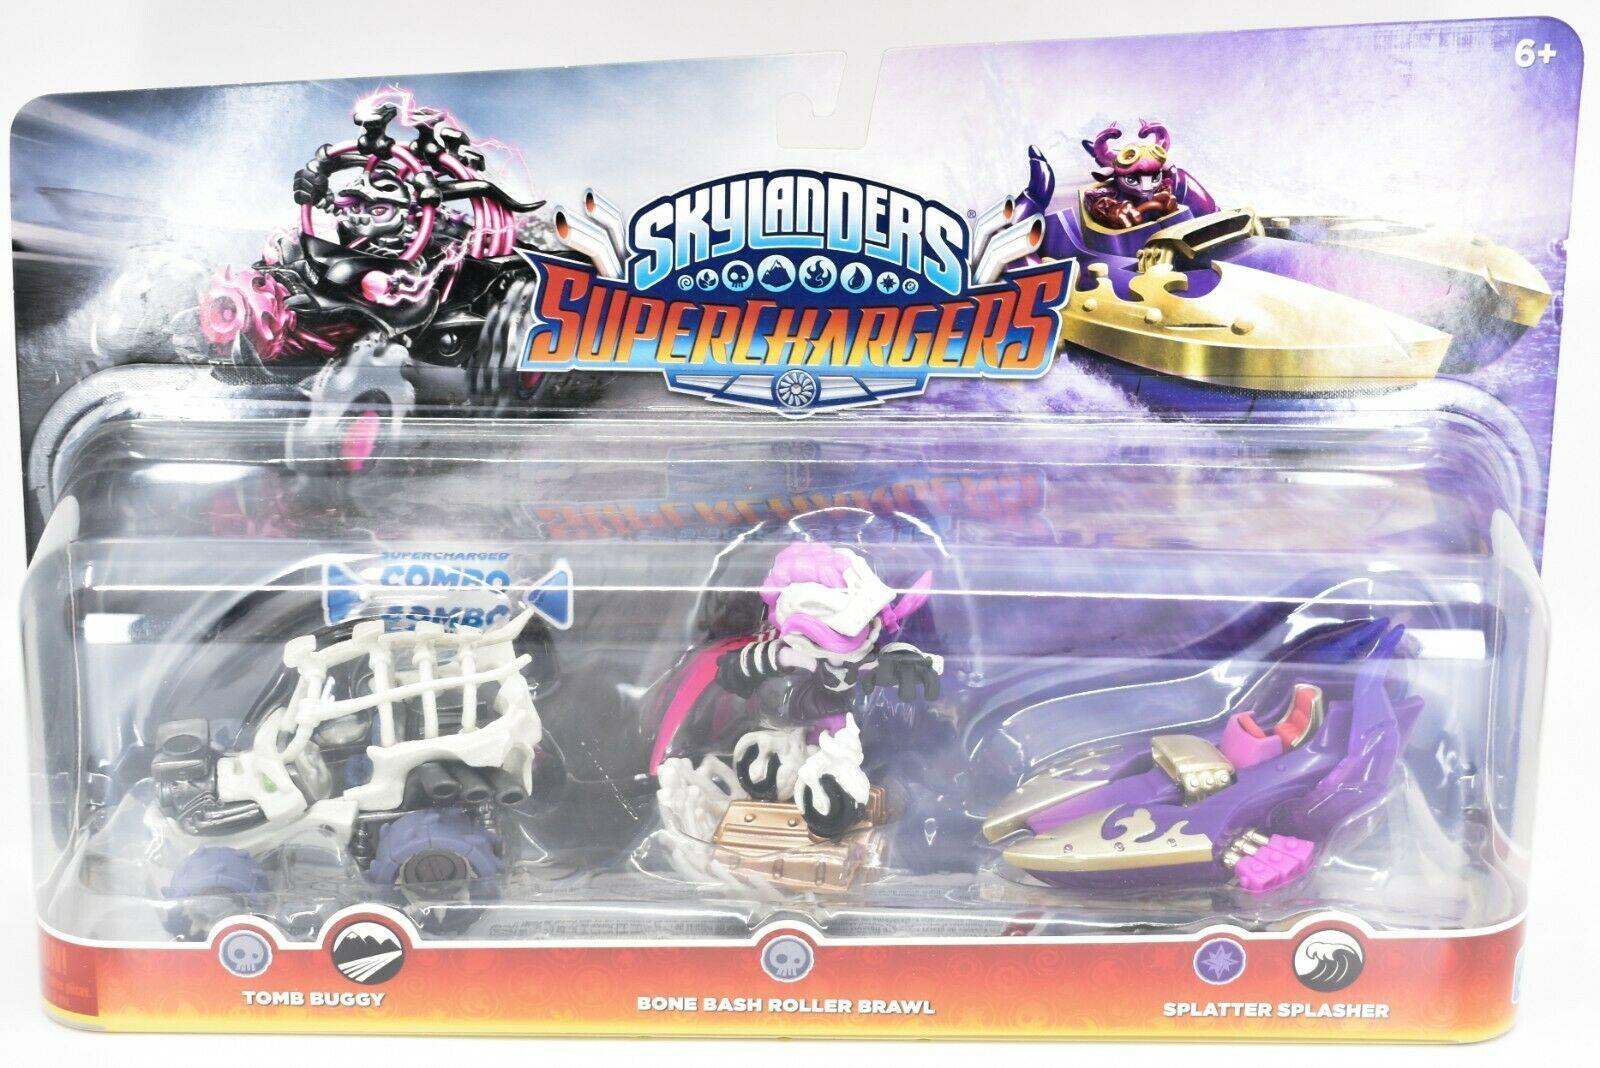 Skylanders Superchargers Tomb Buggy Bone Bash Roller Brawl Splatter Splasher